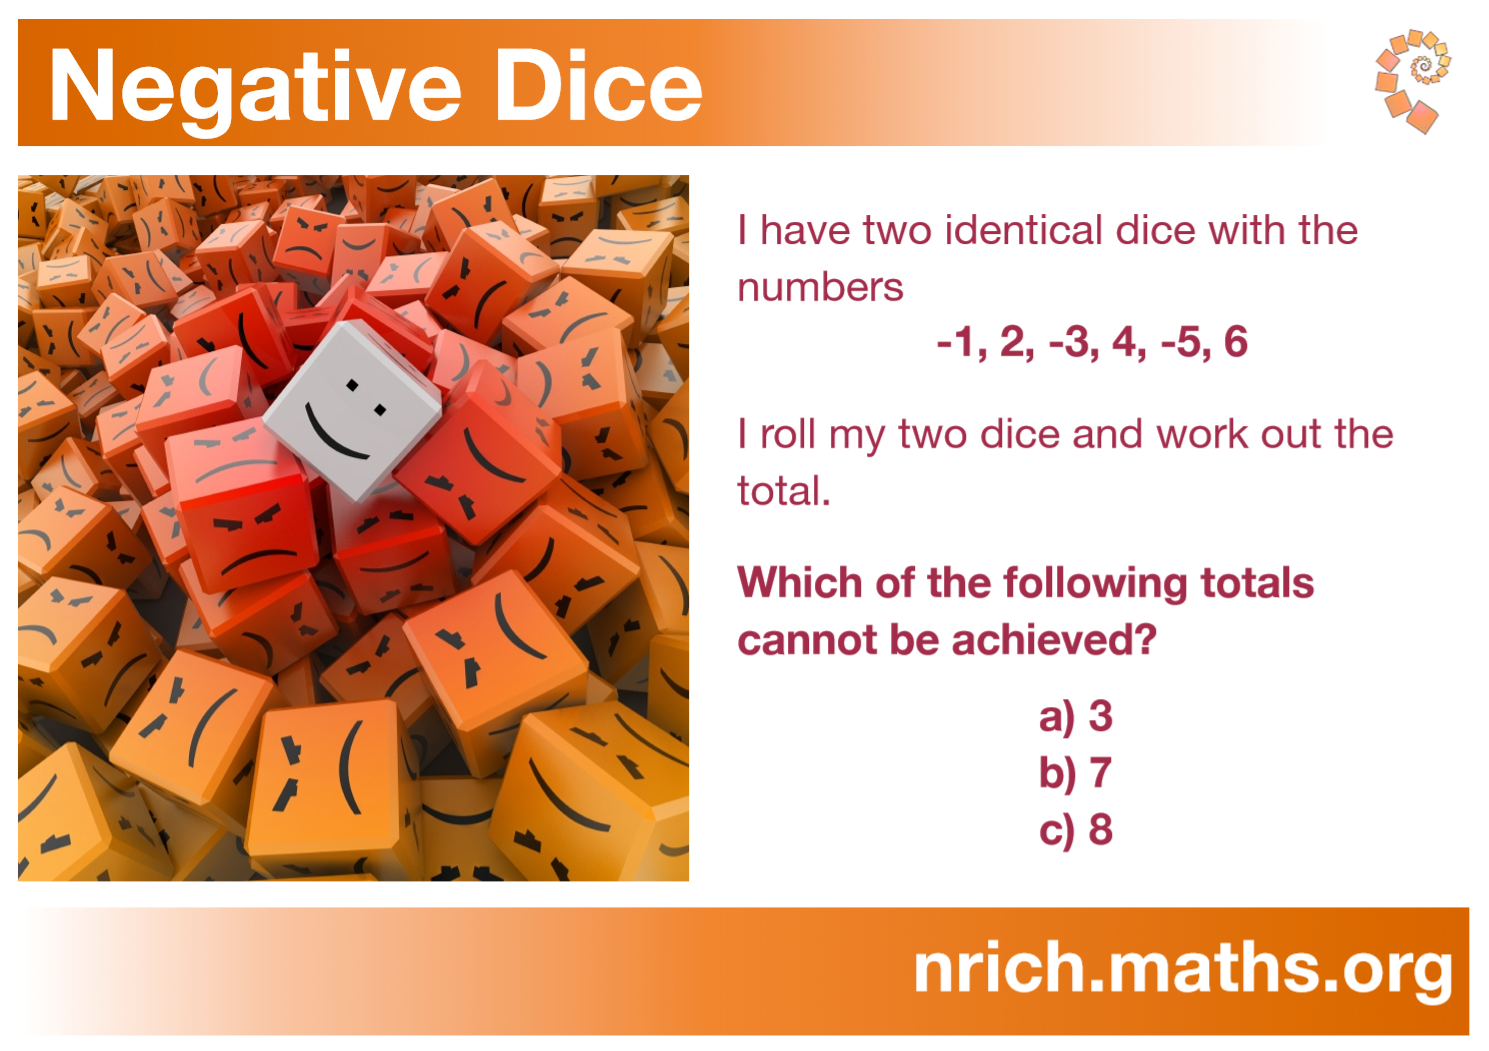 Negative Dice Poster : nrich.maths.org